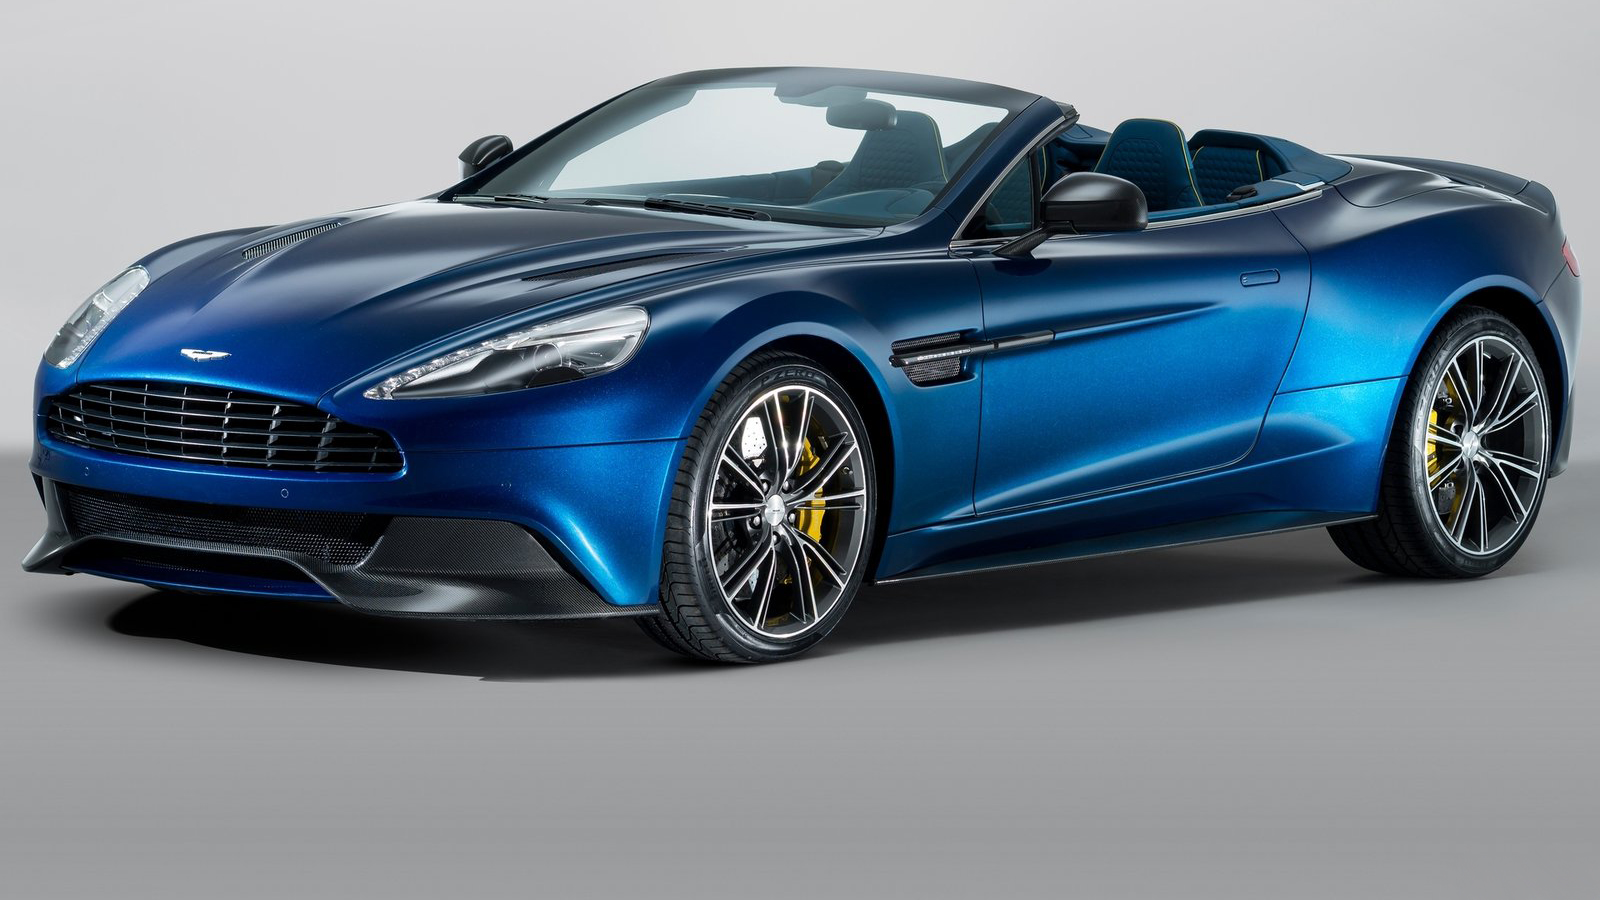 Carwp 297 995 2014 Aston Martin Vanquish Volante Rwd 6 0 V12 573 Cv 63 4 Mkgf 183 Mph 0 62 Mph 4 1 S